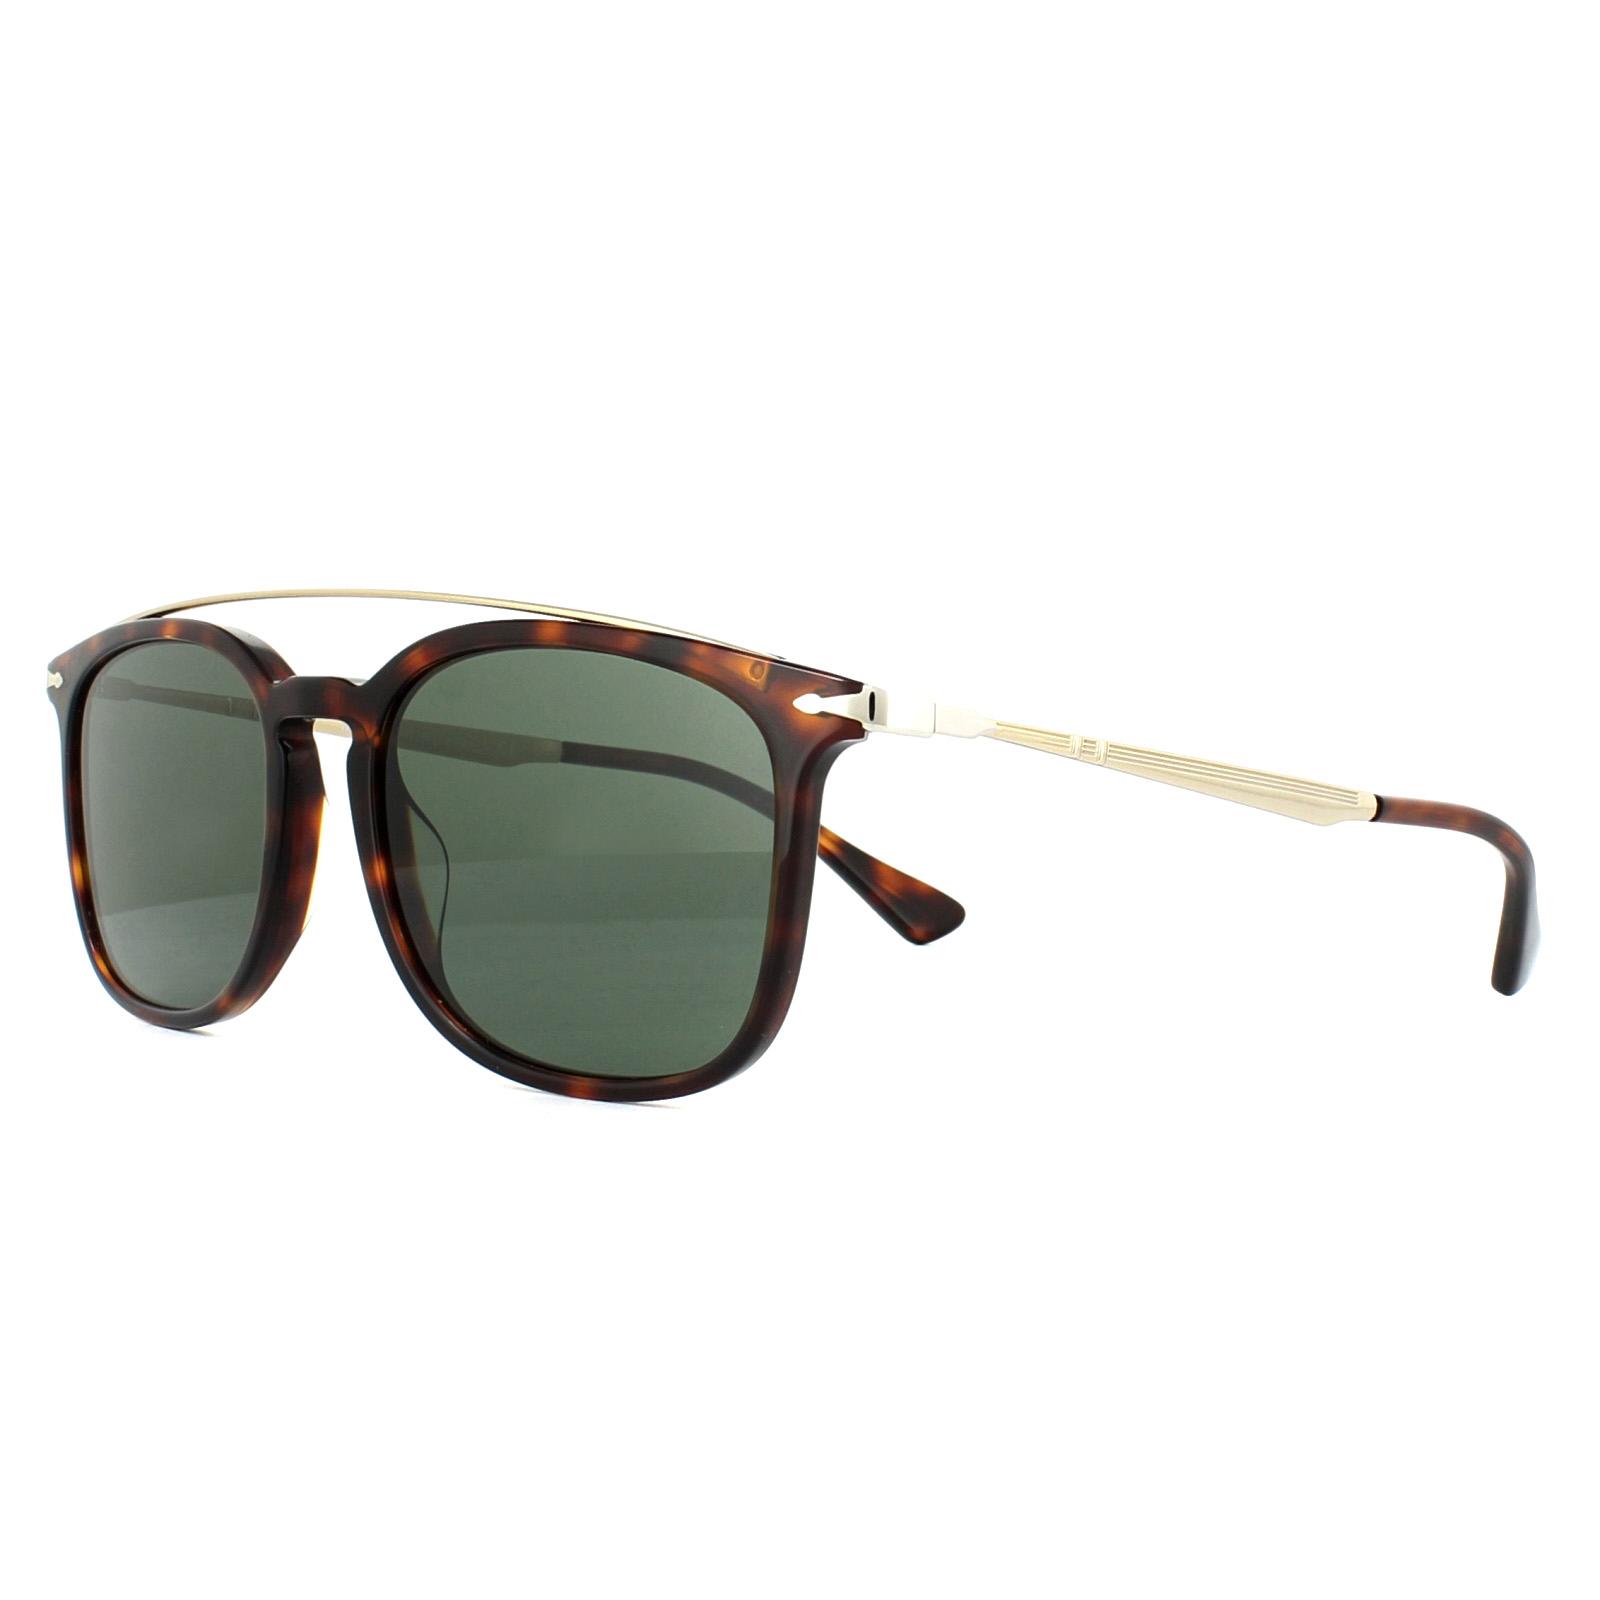 89424d83fc Cheap Persol 3173S Sunglasses - Discounted Sunglasses